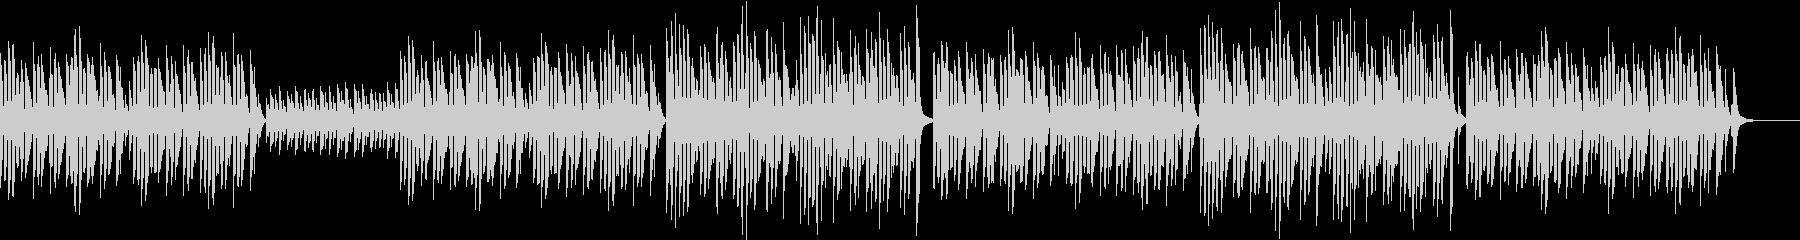 bpm088 キッズTikTok可愛い笛の未再生の波形